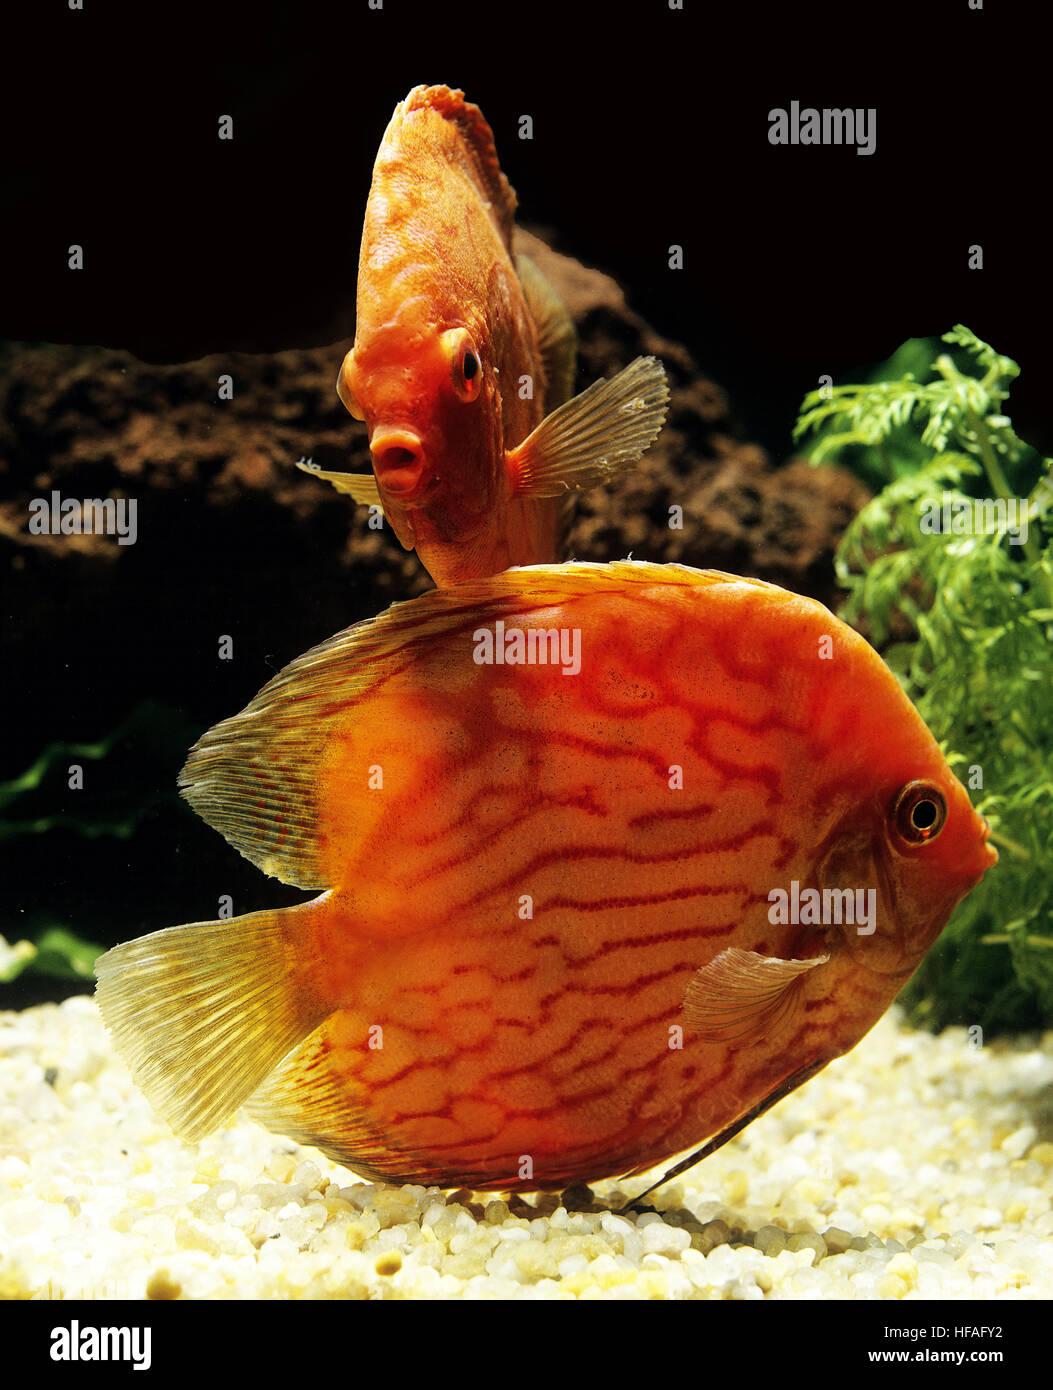 Pigeon Blood Discus Fish Stock Photos & Pigeon Blood Discus Fish ...